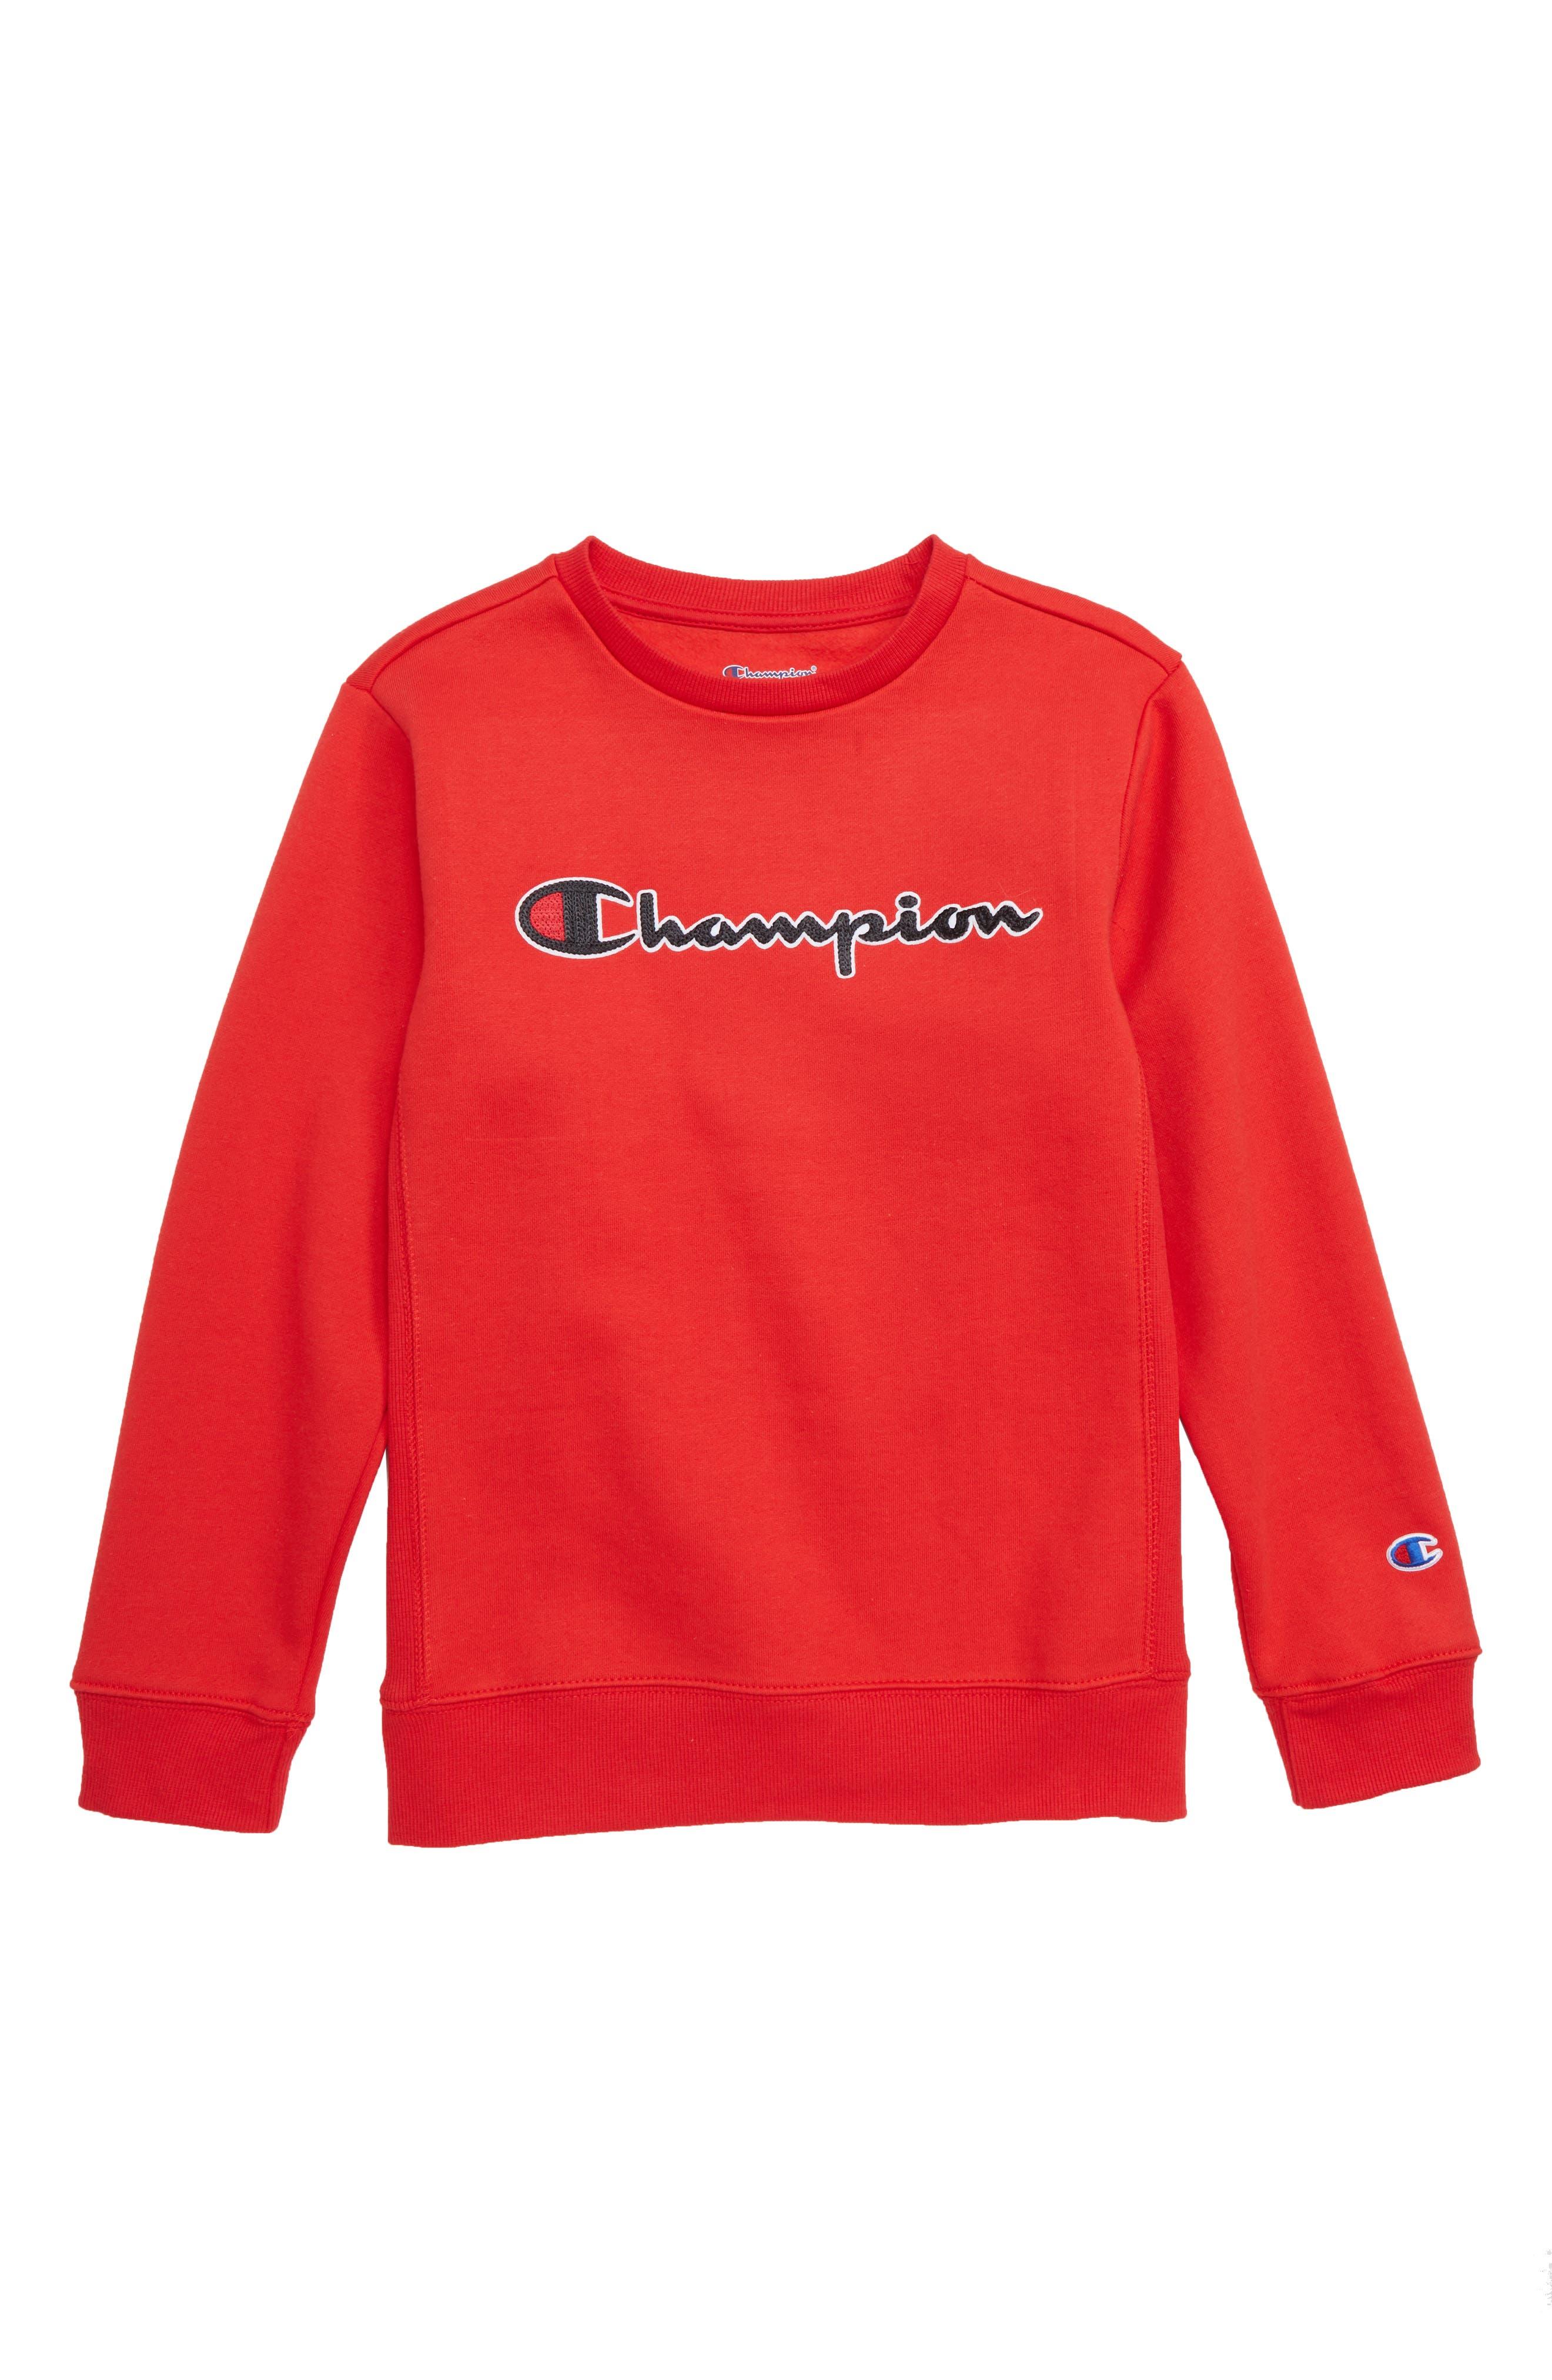 champion t shirt kids navy